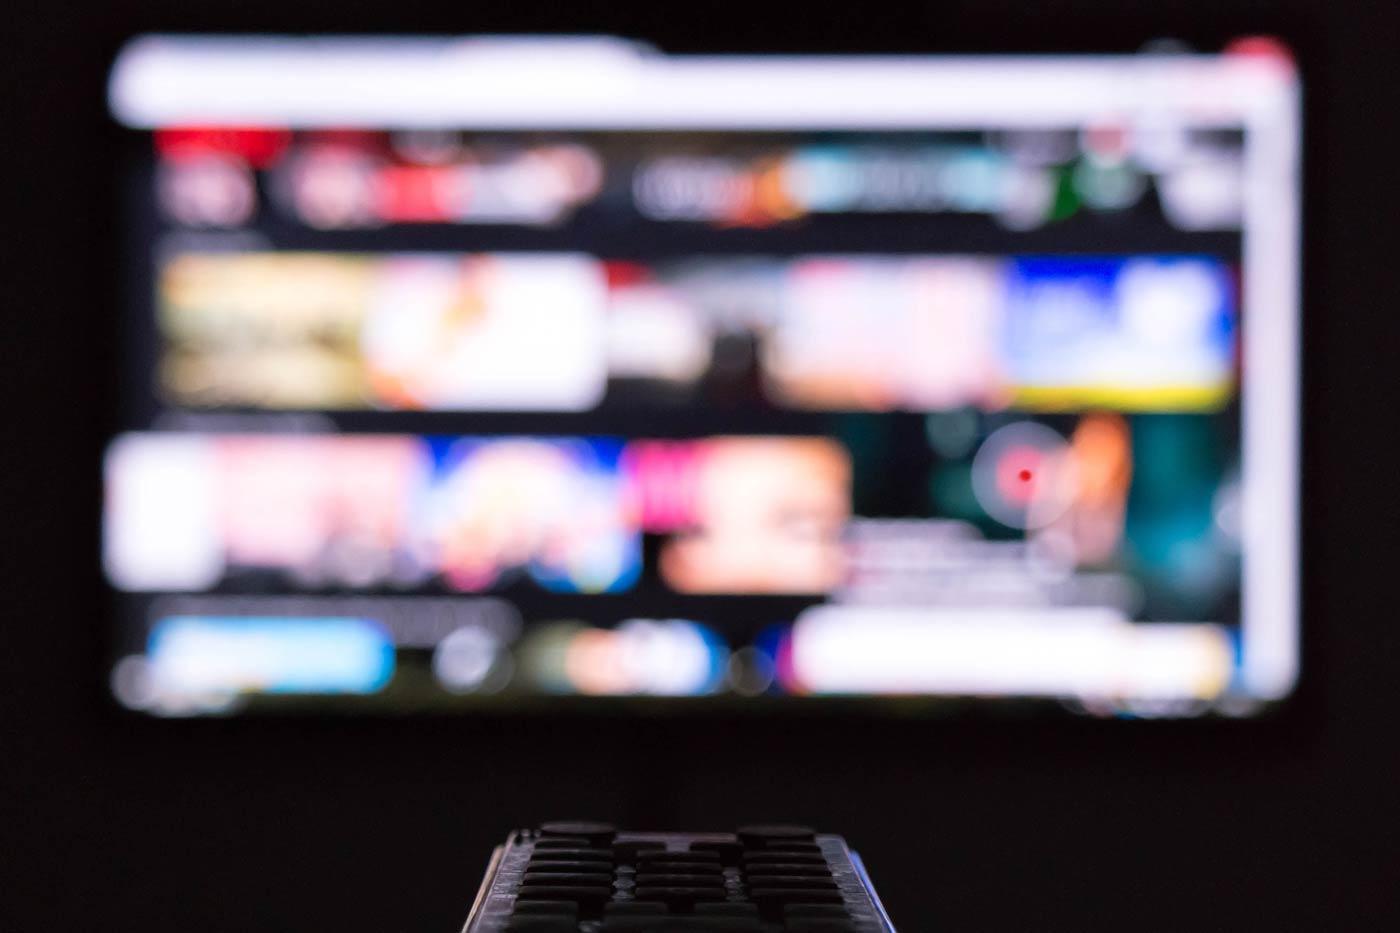 ekran telewizora